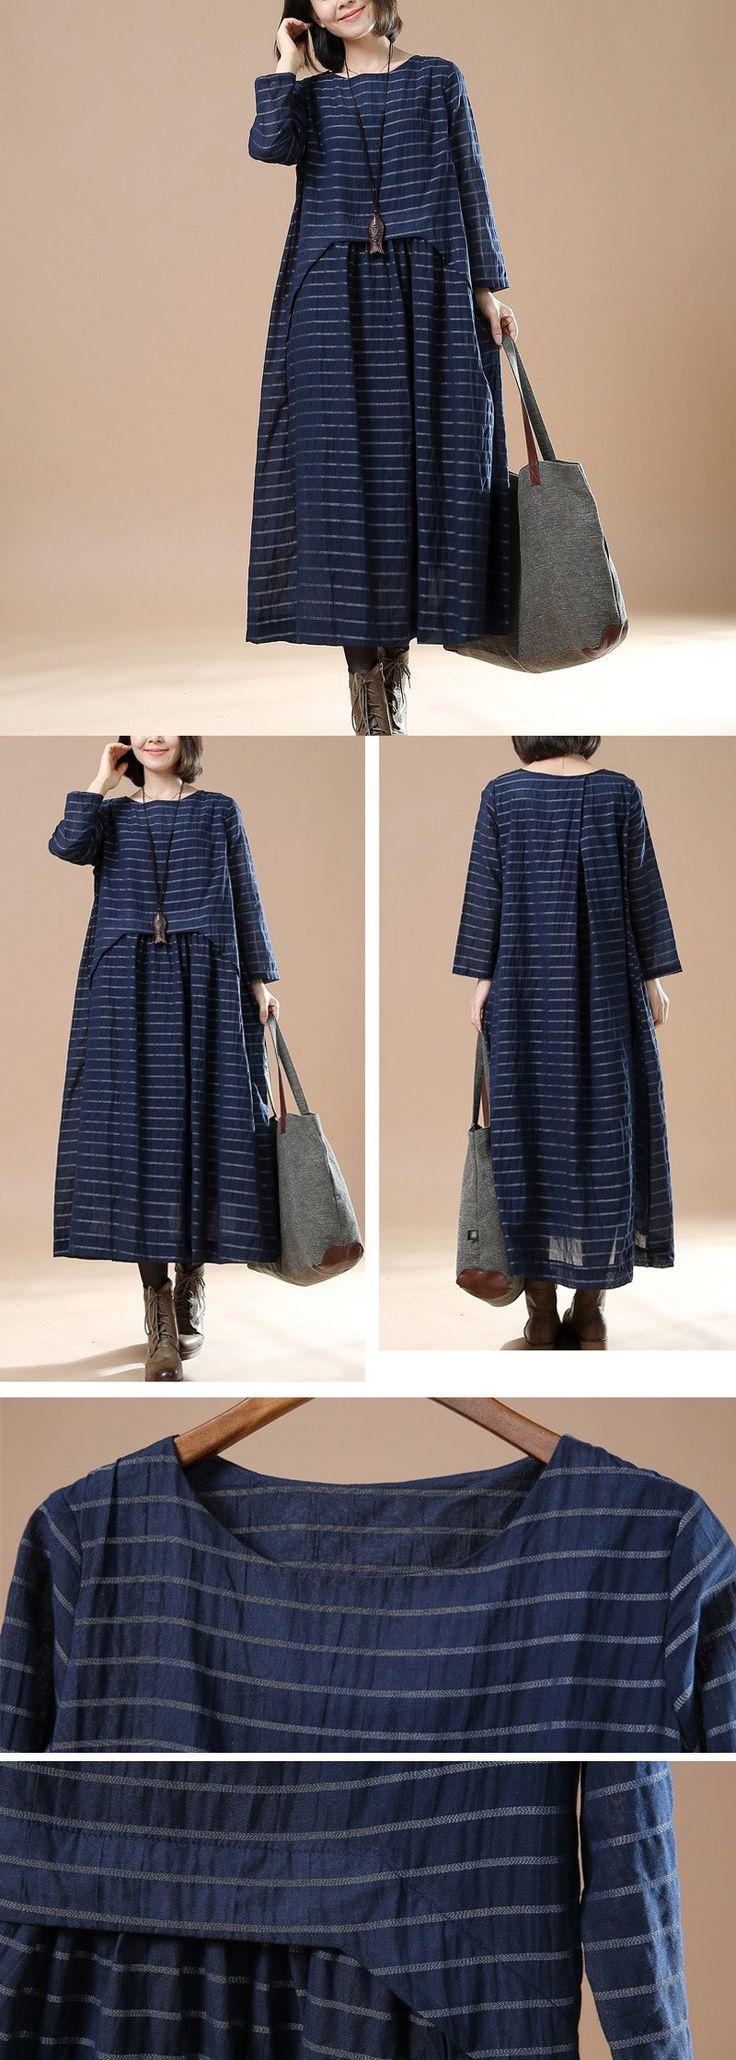 BUYKUD-Blue Women 100% cotton loose long sleeve dress. buykud dresses